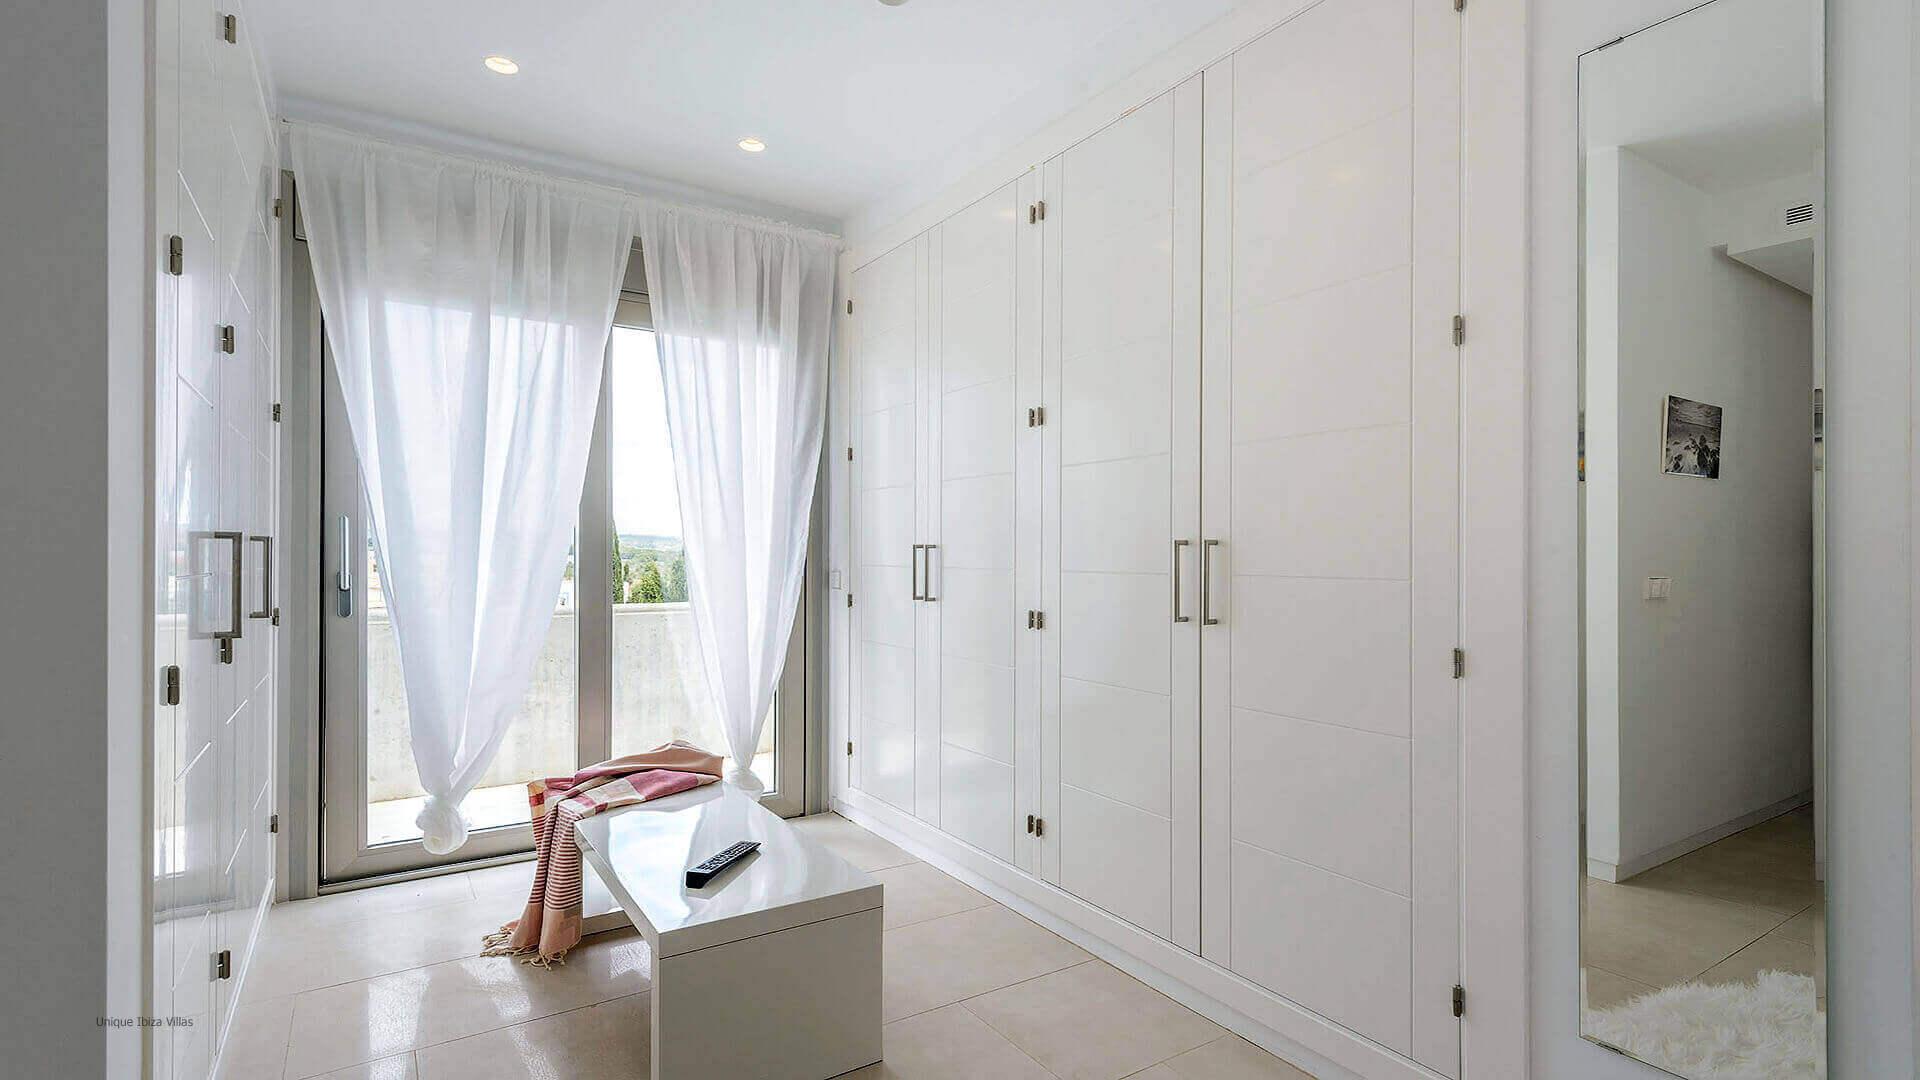 Villa Montecristo Ibiza 29 Bedroom 1